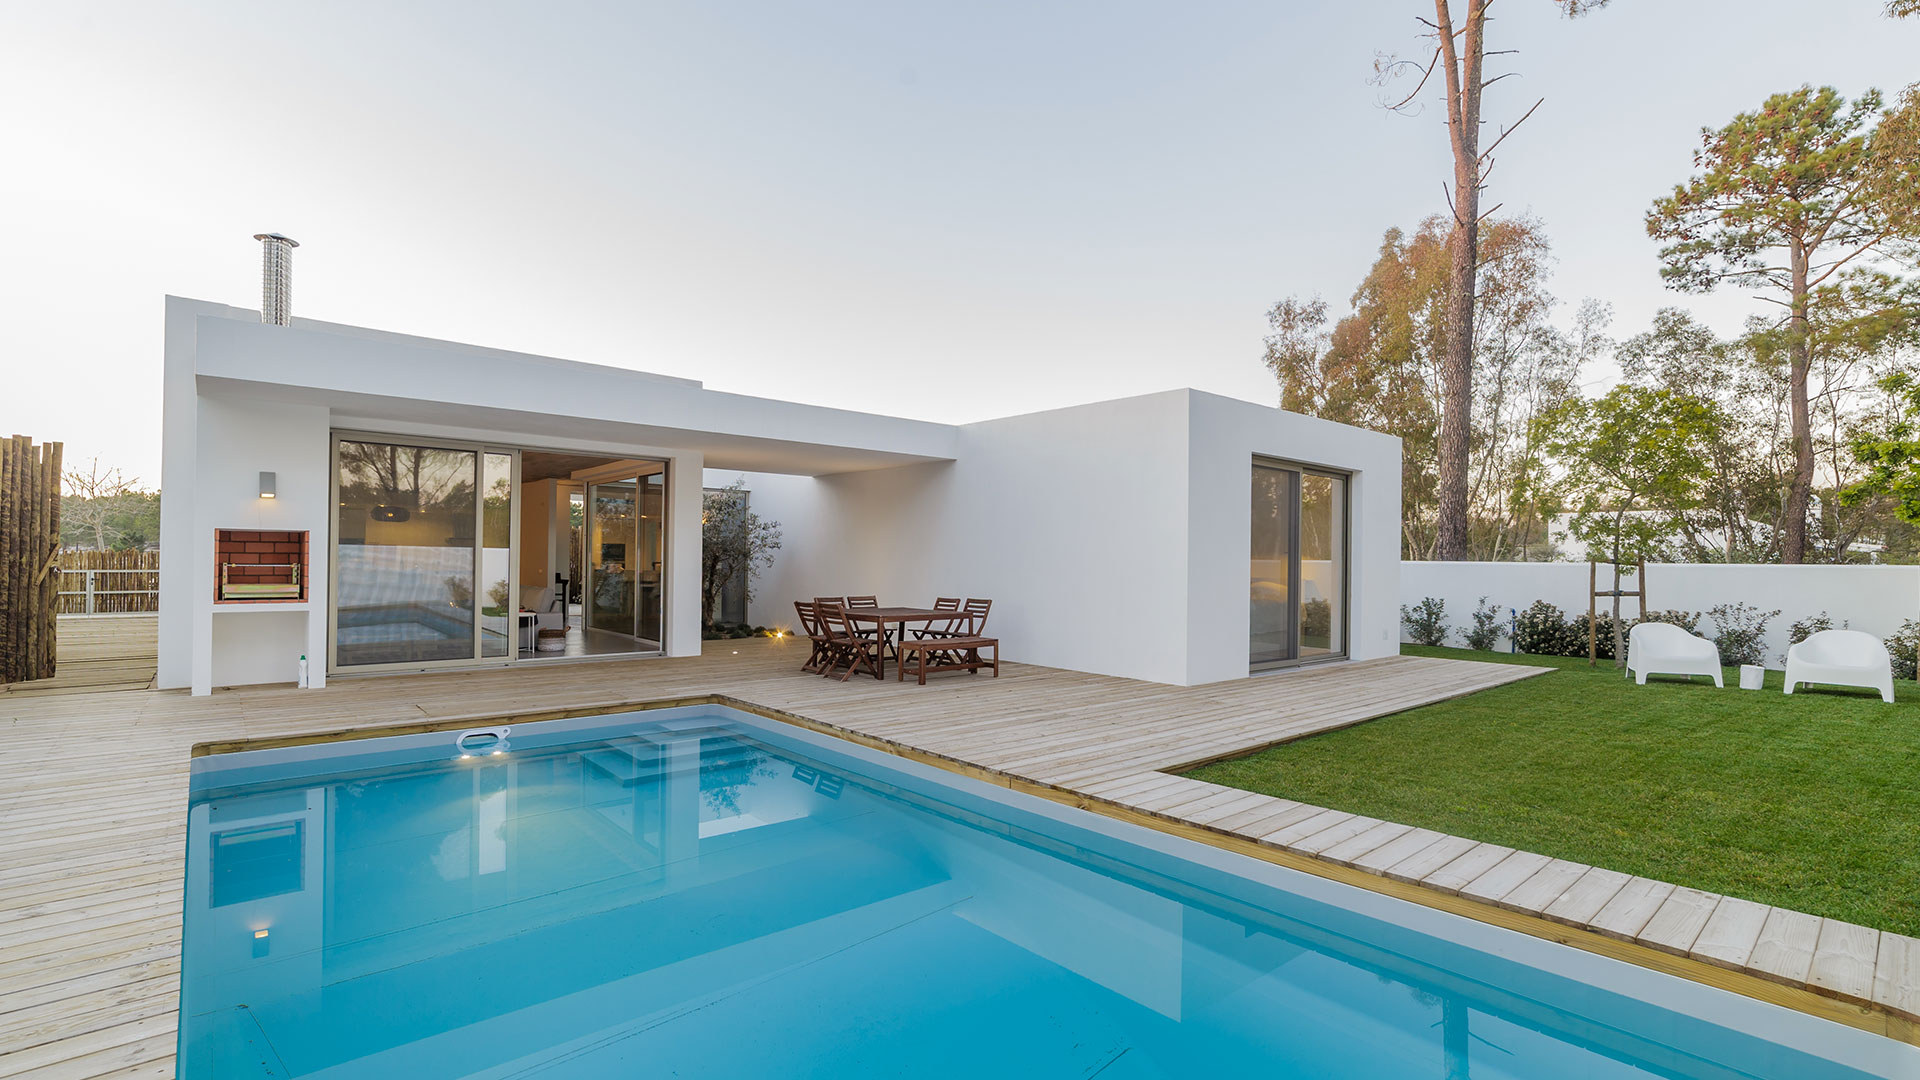 Terrain-constructible-a-vendre-Hyeres-83400-Sarannier-